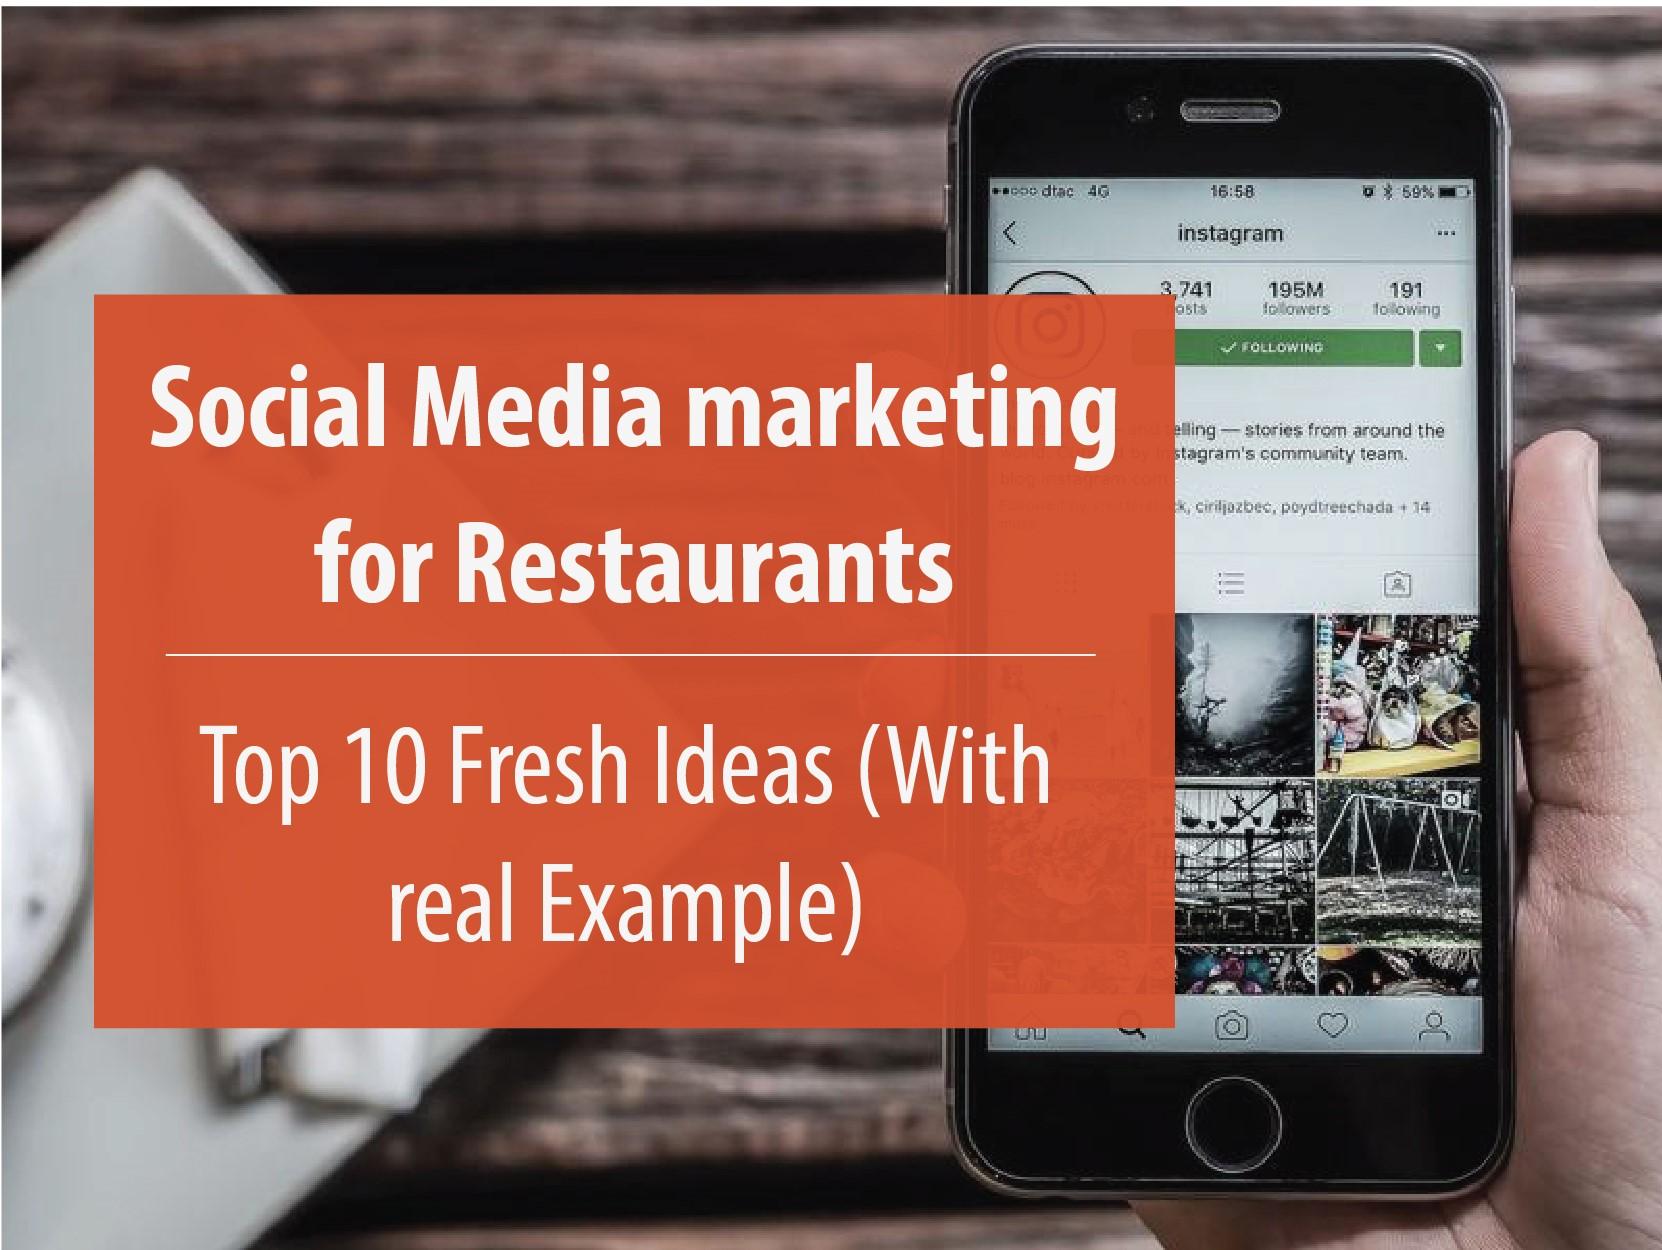 Restaurant Social Media Marketing - Top 10 Ideas (with examples)